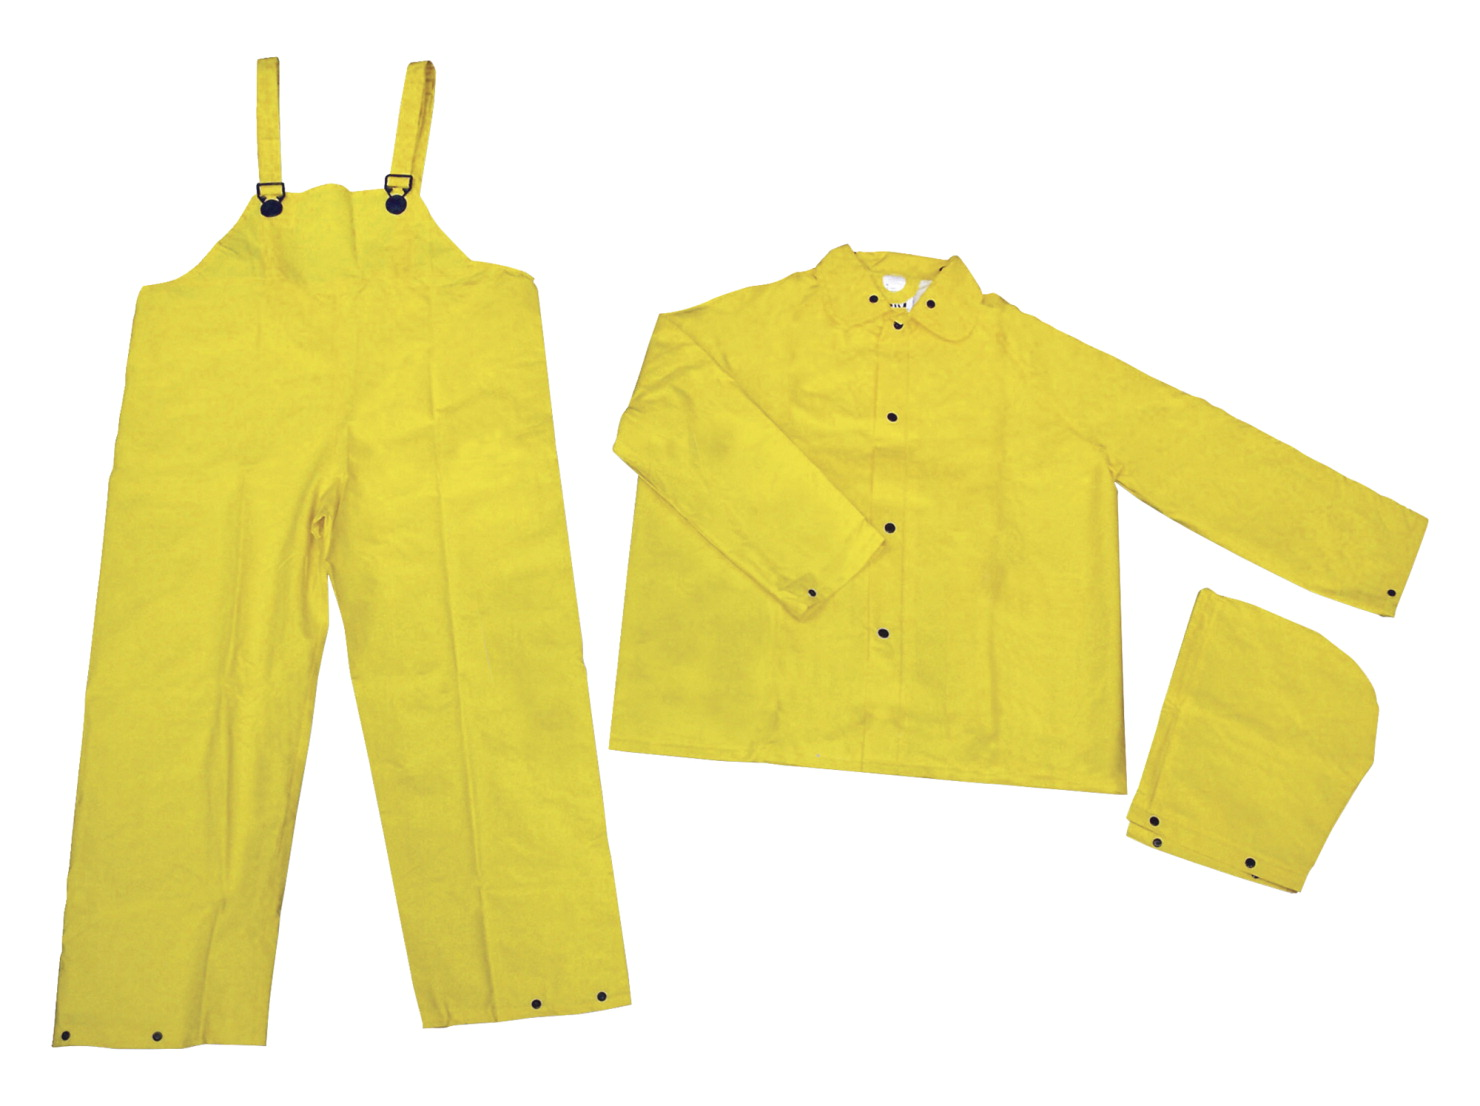 b315cf30288 R3 Safety MCR Safety 3-Piece Rainsuit